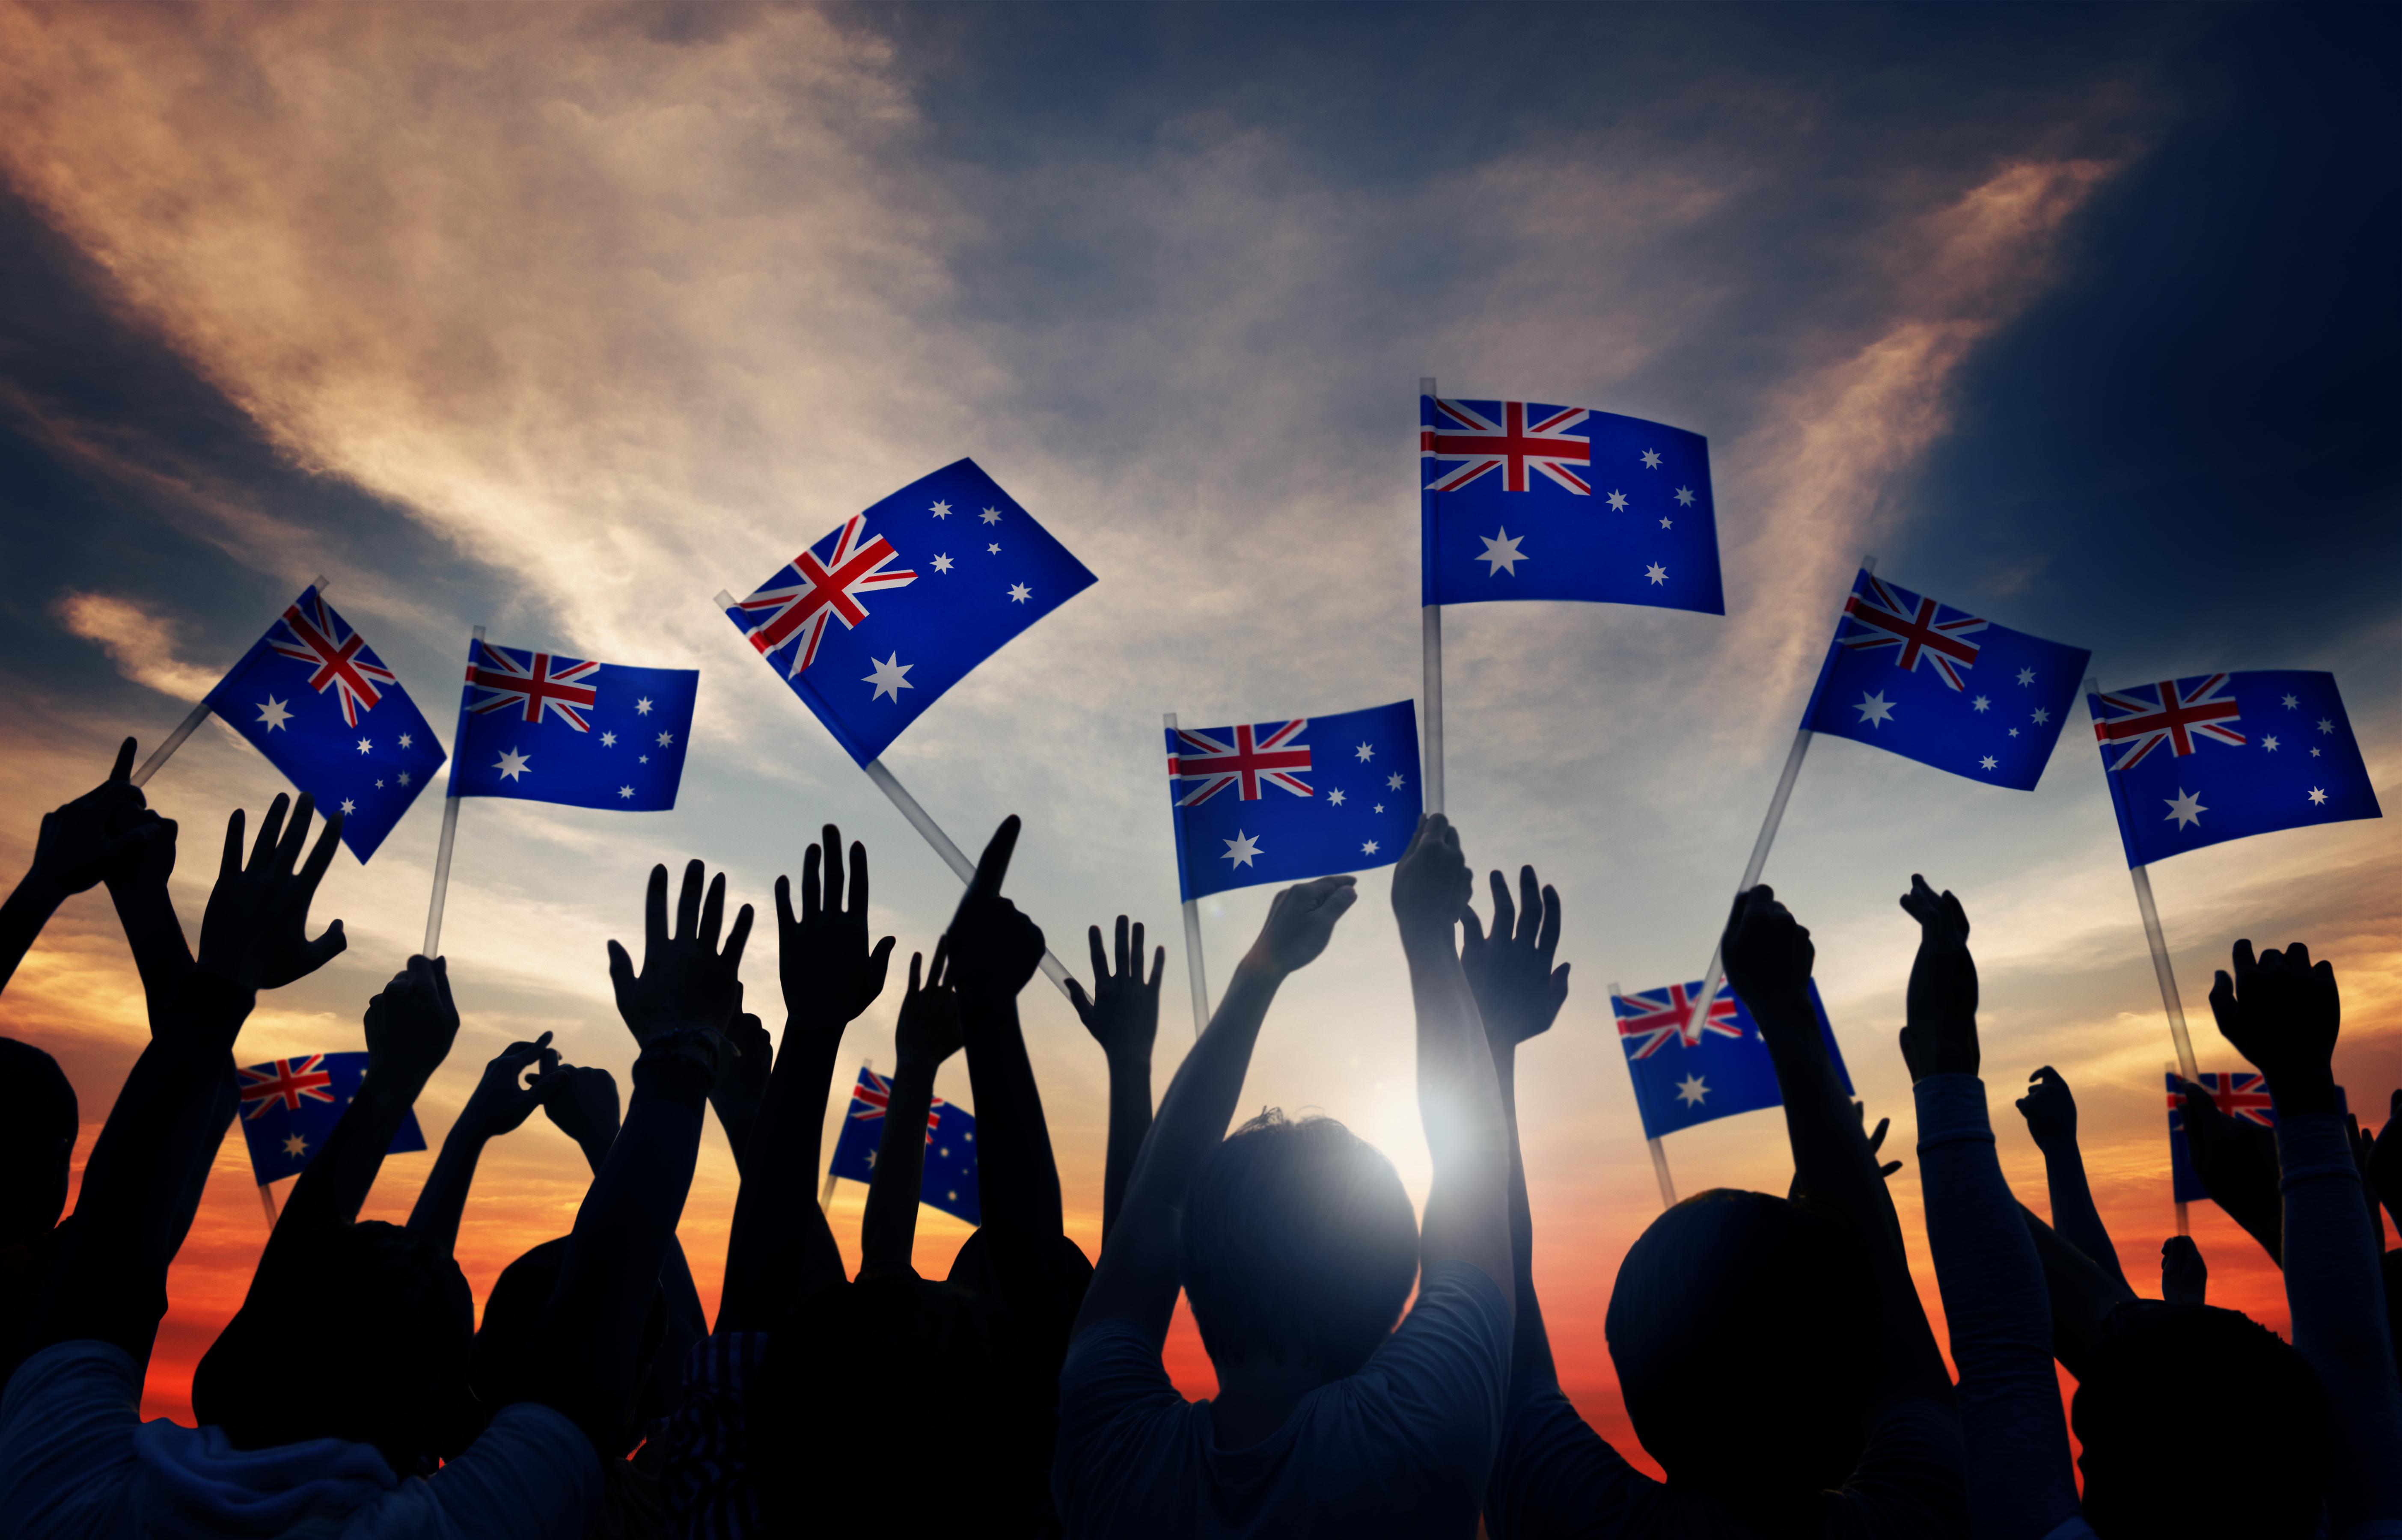 Memorial Songs by Australian Artists